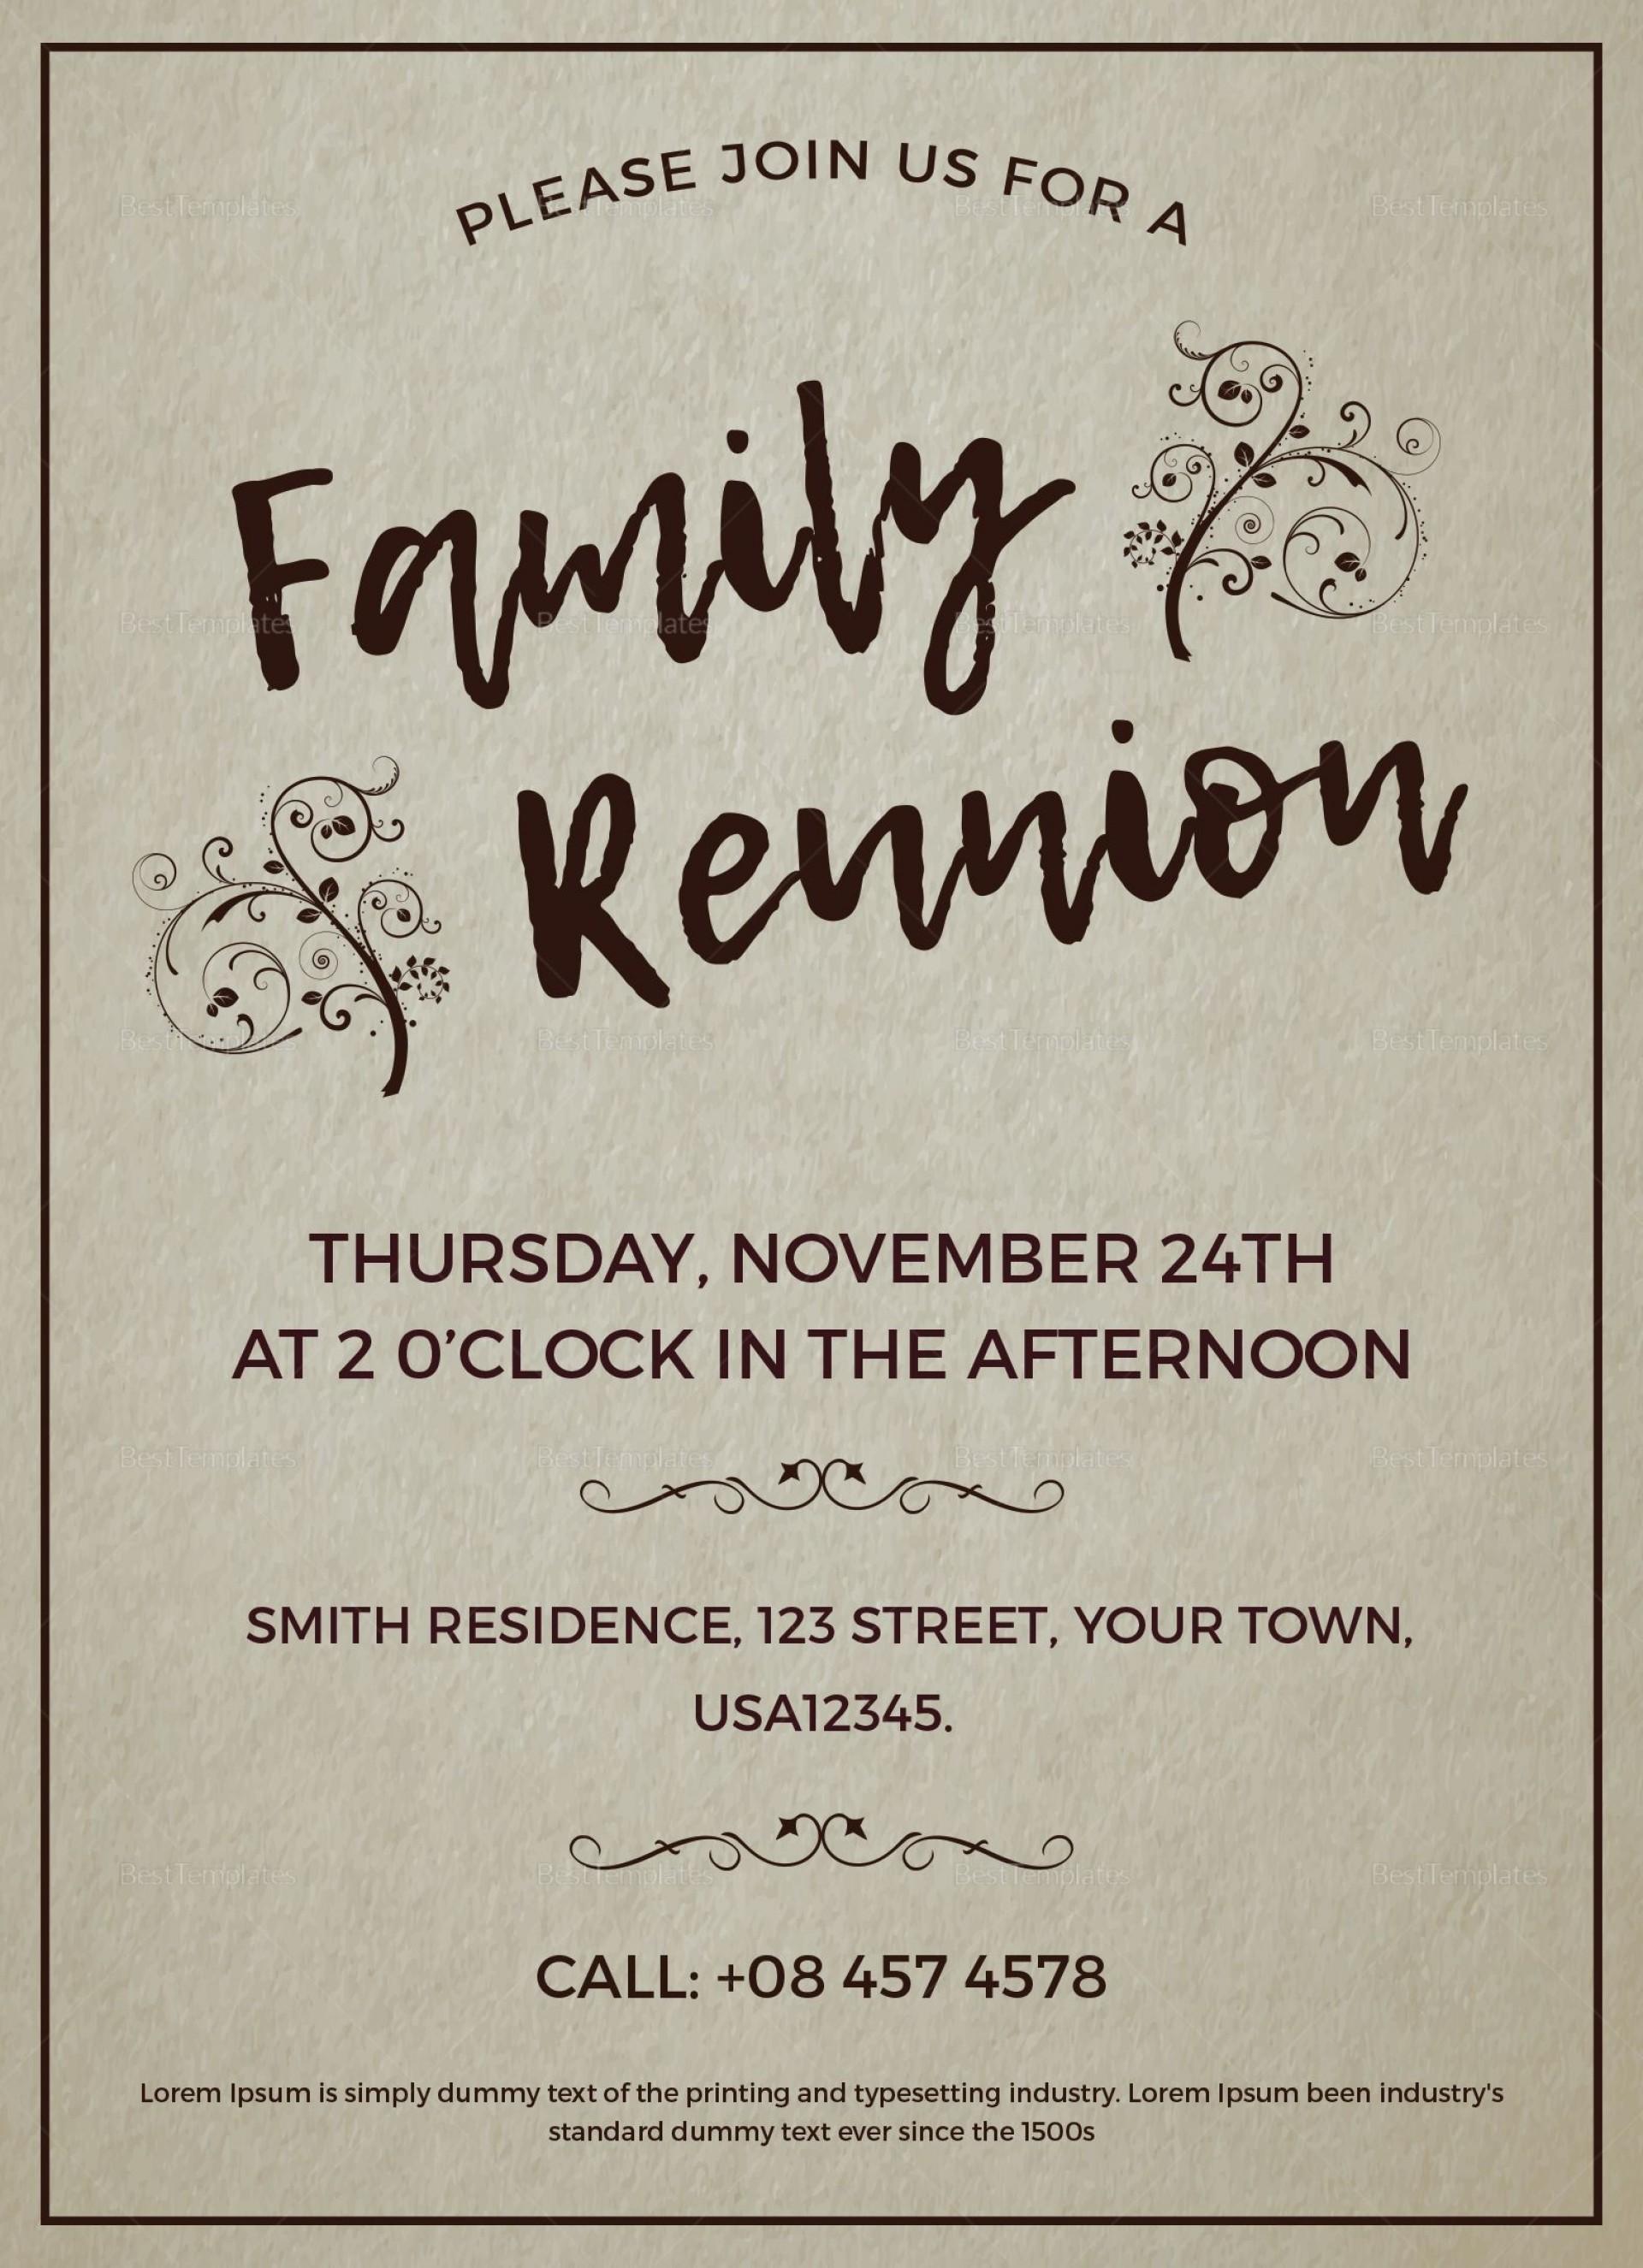 003 Excellent Free Downloadable Family Reunion Flyer Template Concept 1920